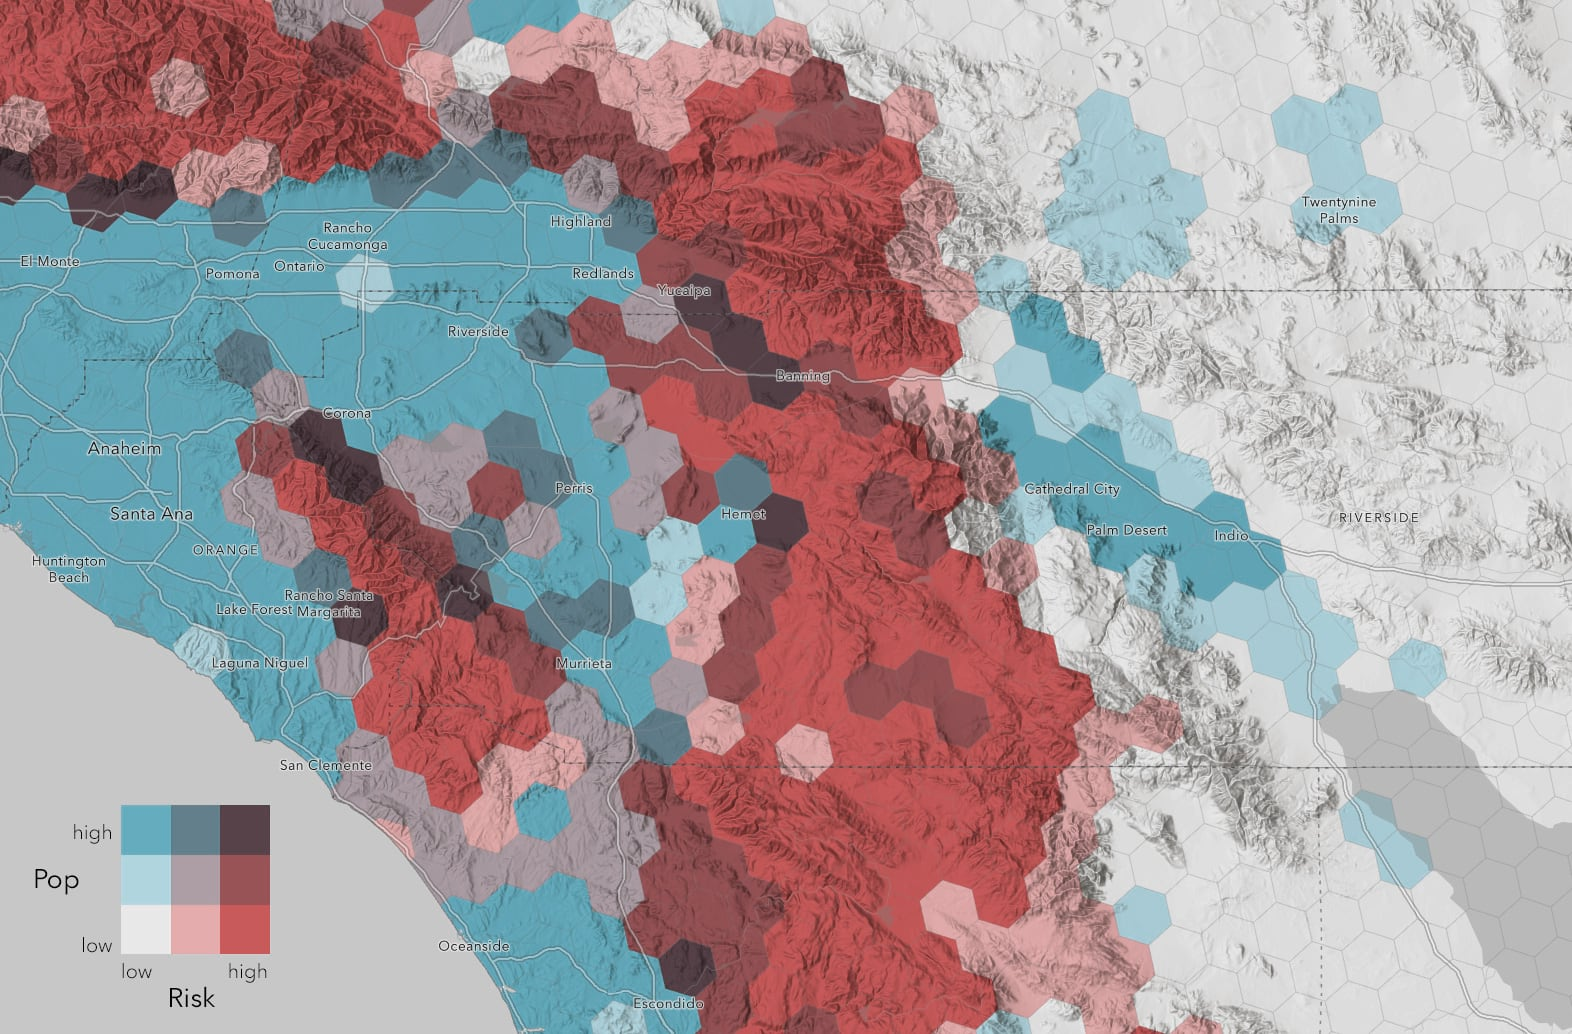 population density vs wildfire hazard map